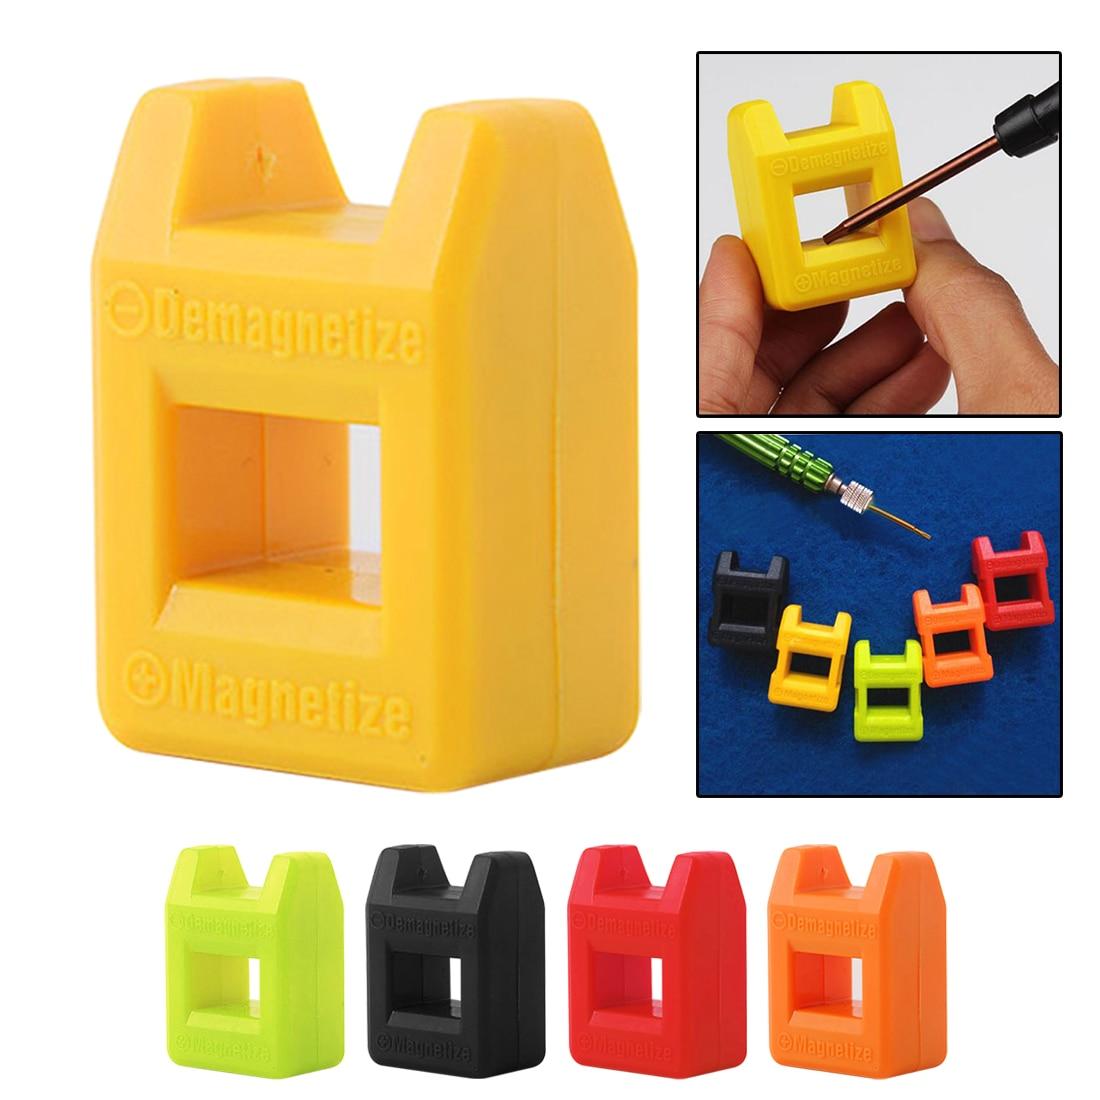 Magnetizer Demagnetizer 2 In 1 Tool Screwdriver Magnetic High Quality Colour Send Random Mini - Fast